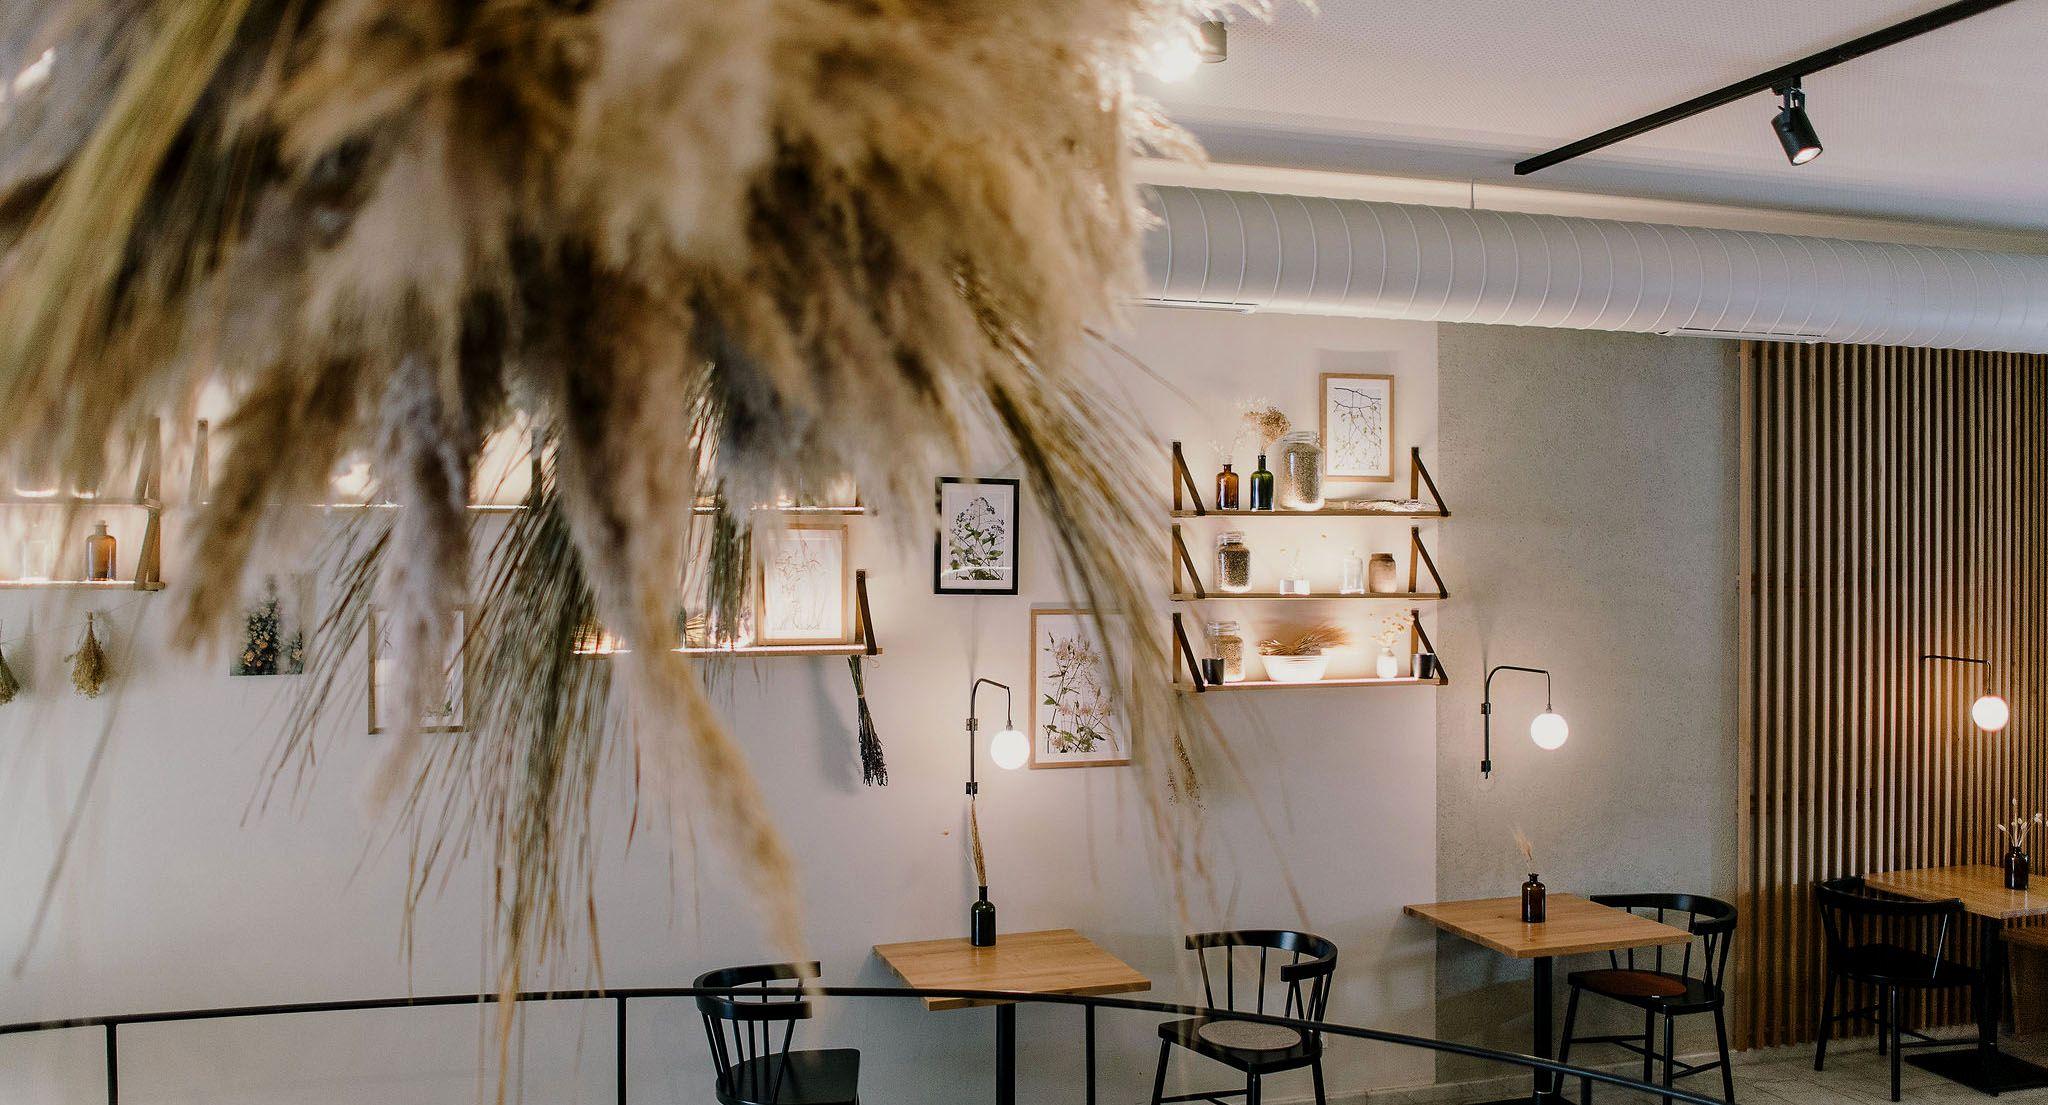 KITZ – Bar. Café. Röstbroterei